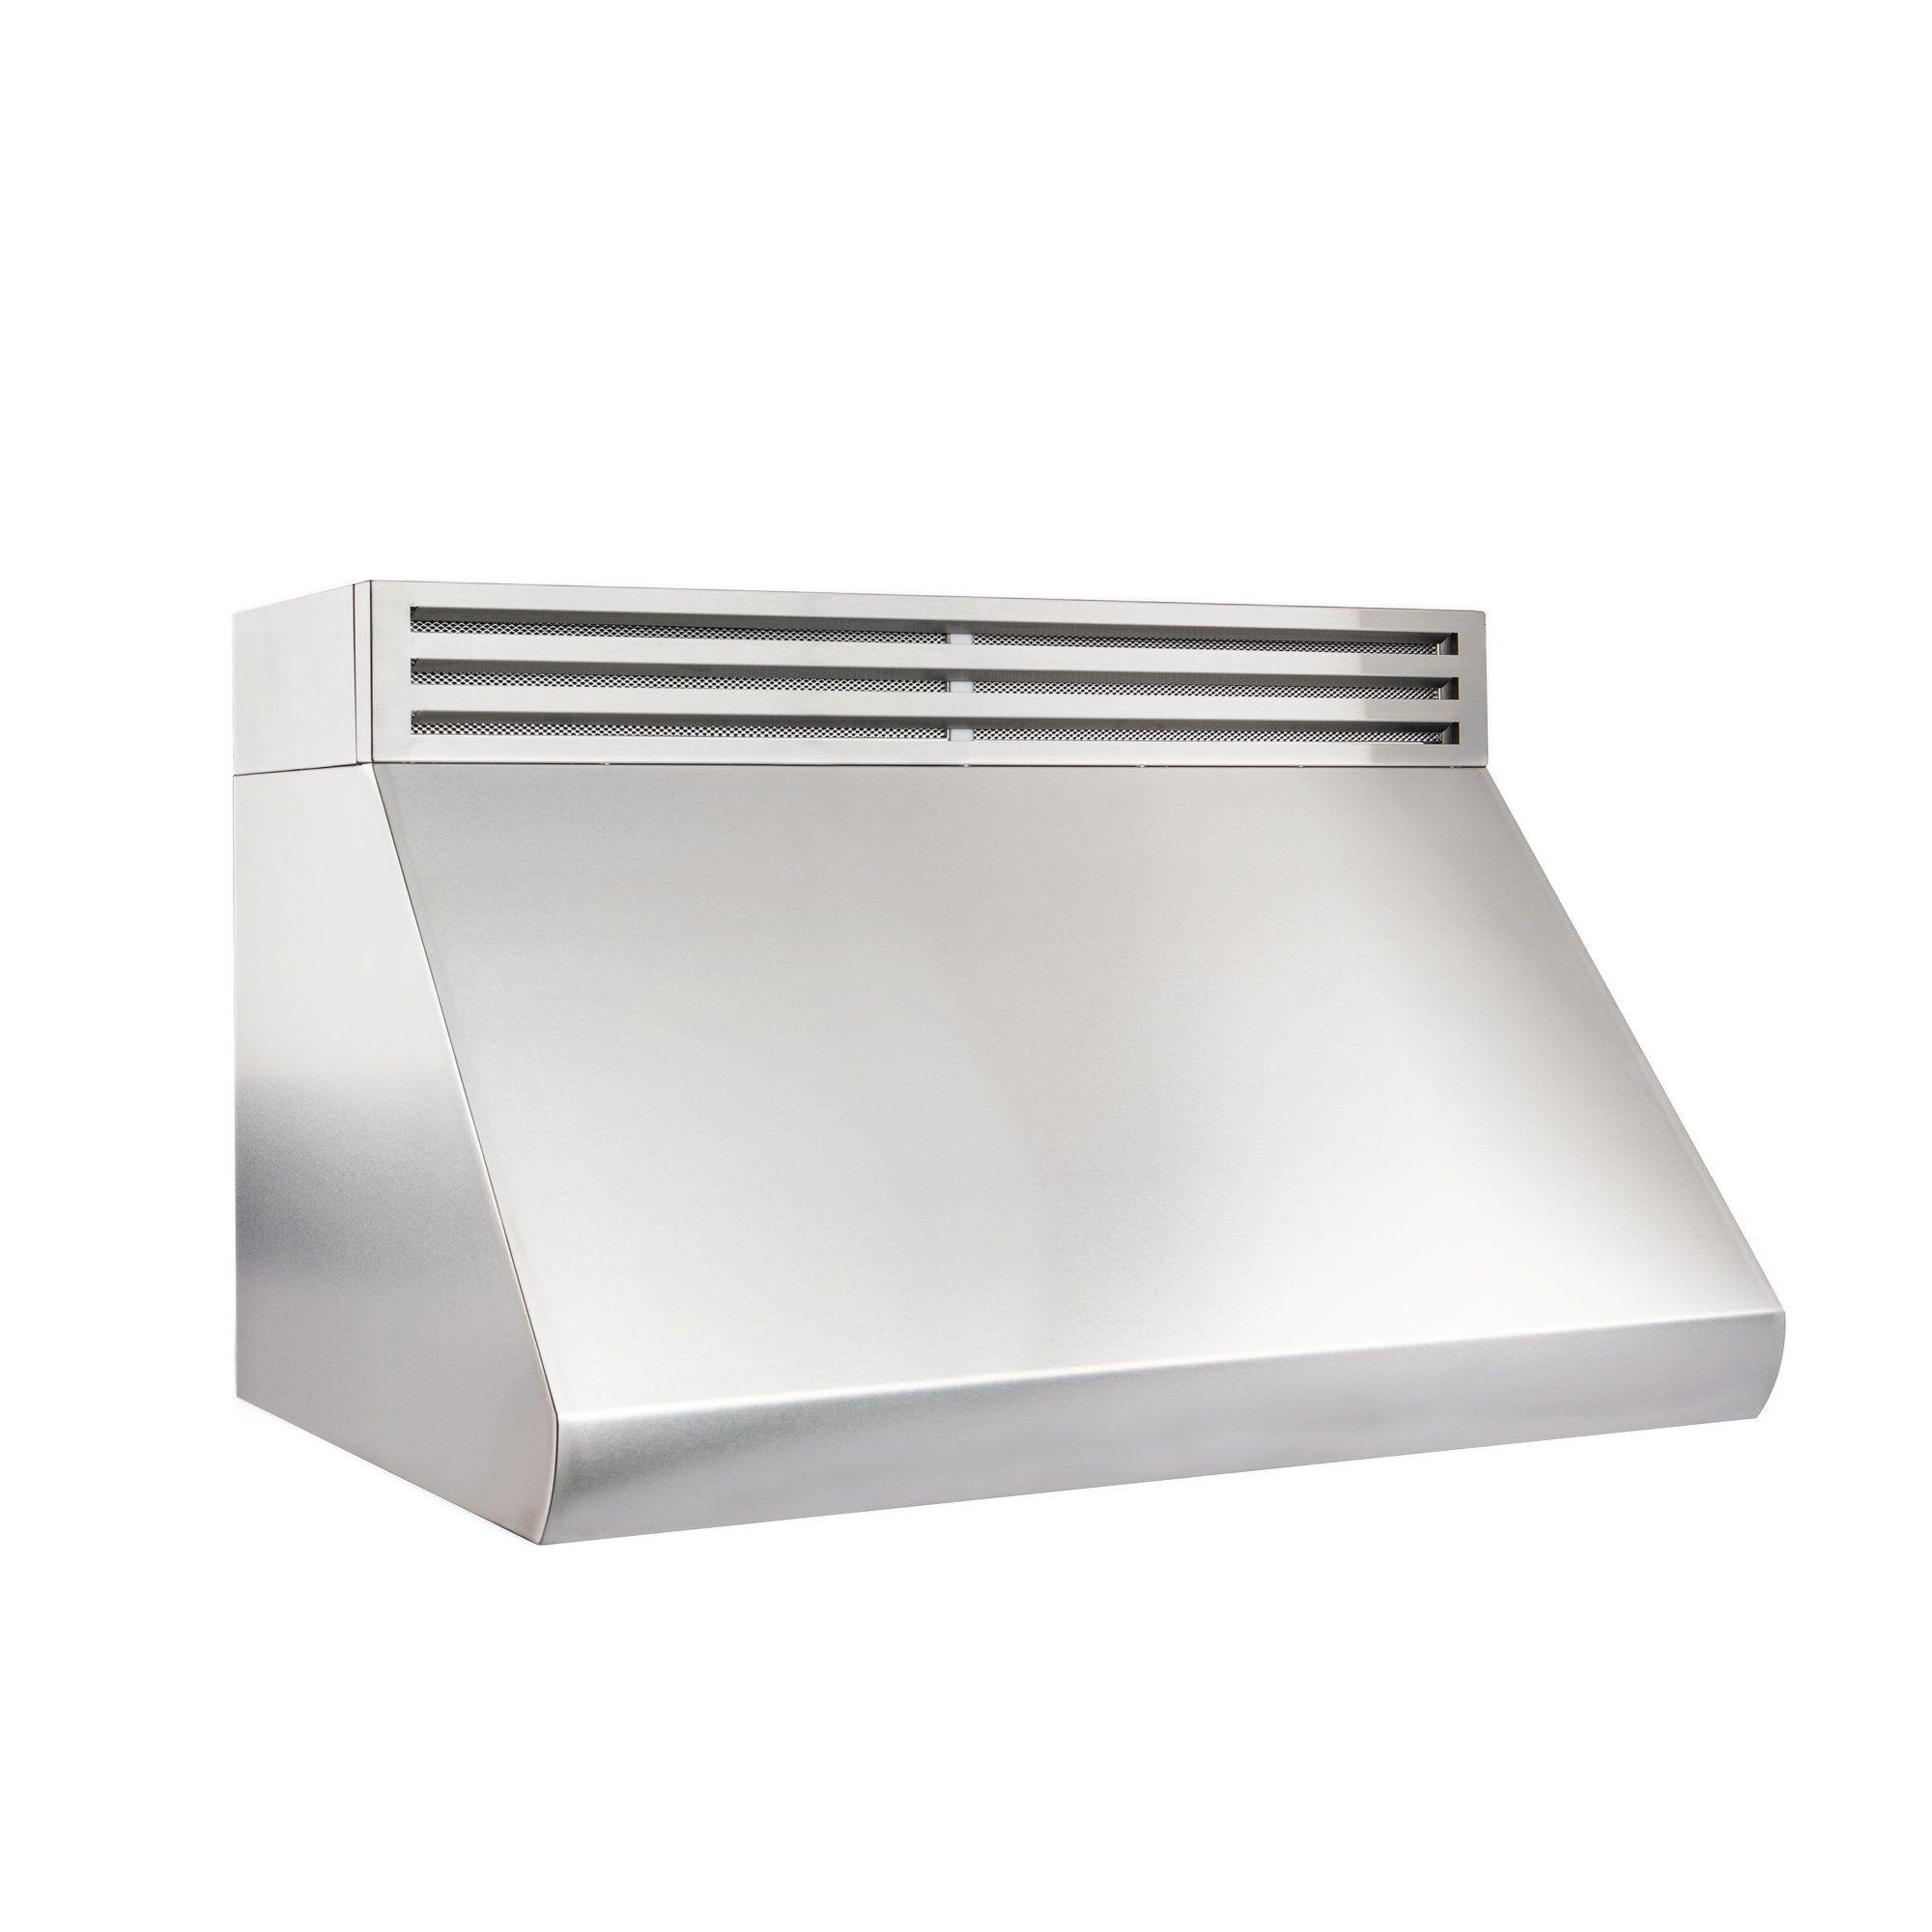 ZLINE 48 in. Recirculating Under Cabinet Range Hood In Stainless Steel (RK527-48)